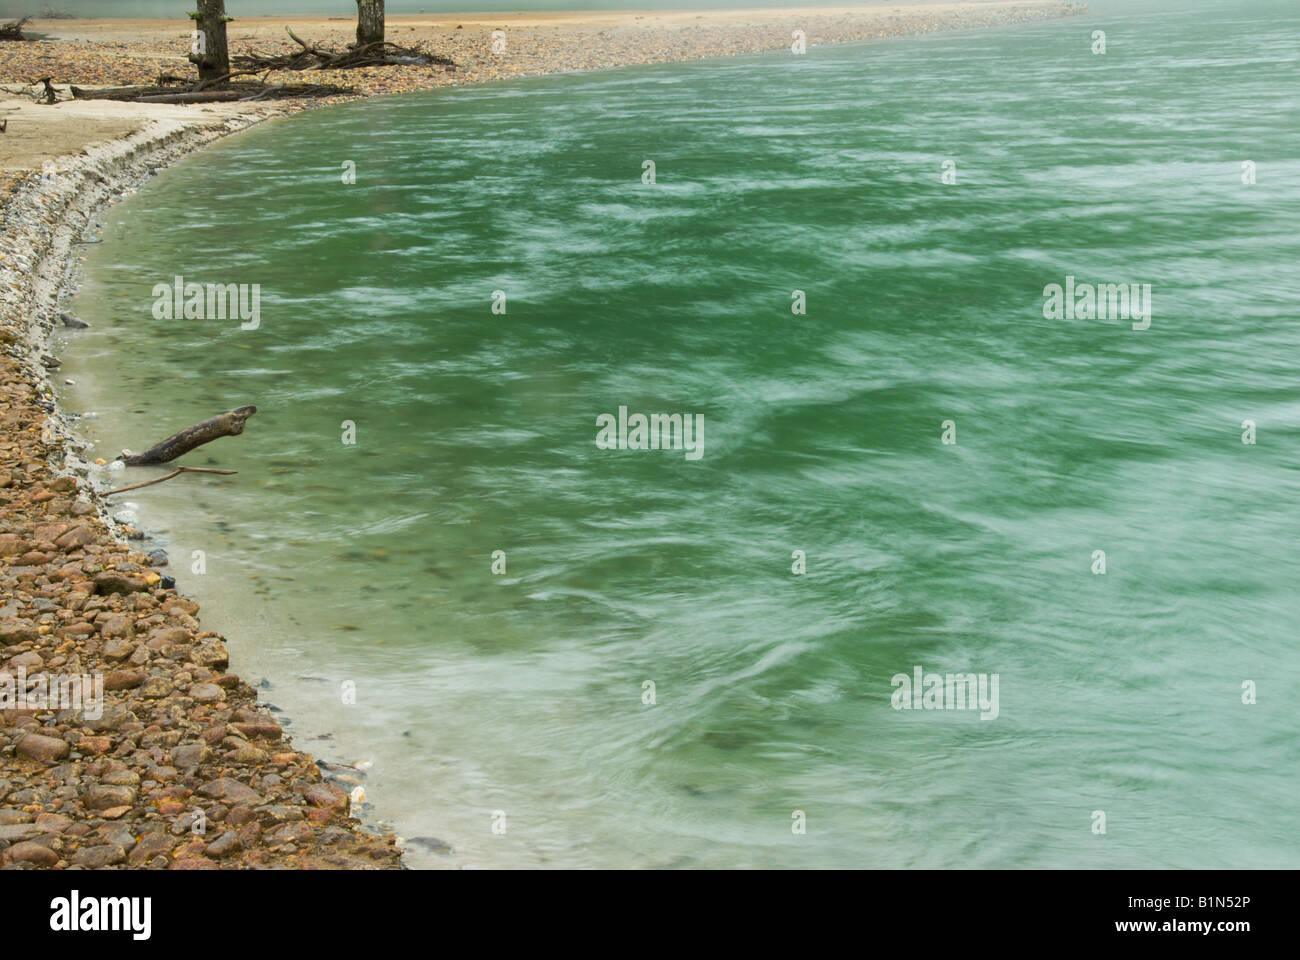 Water flowing at Taisho Ike Pond at Kamikochi. Taisho-Ike was formed when neighbouring Mount Yake (Yakedake) erupted - Stock Image